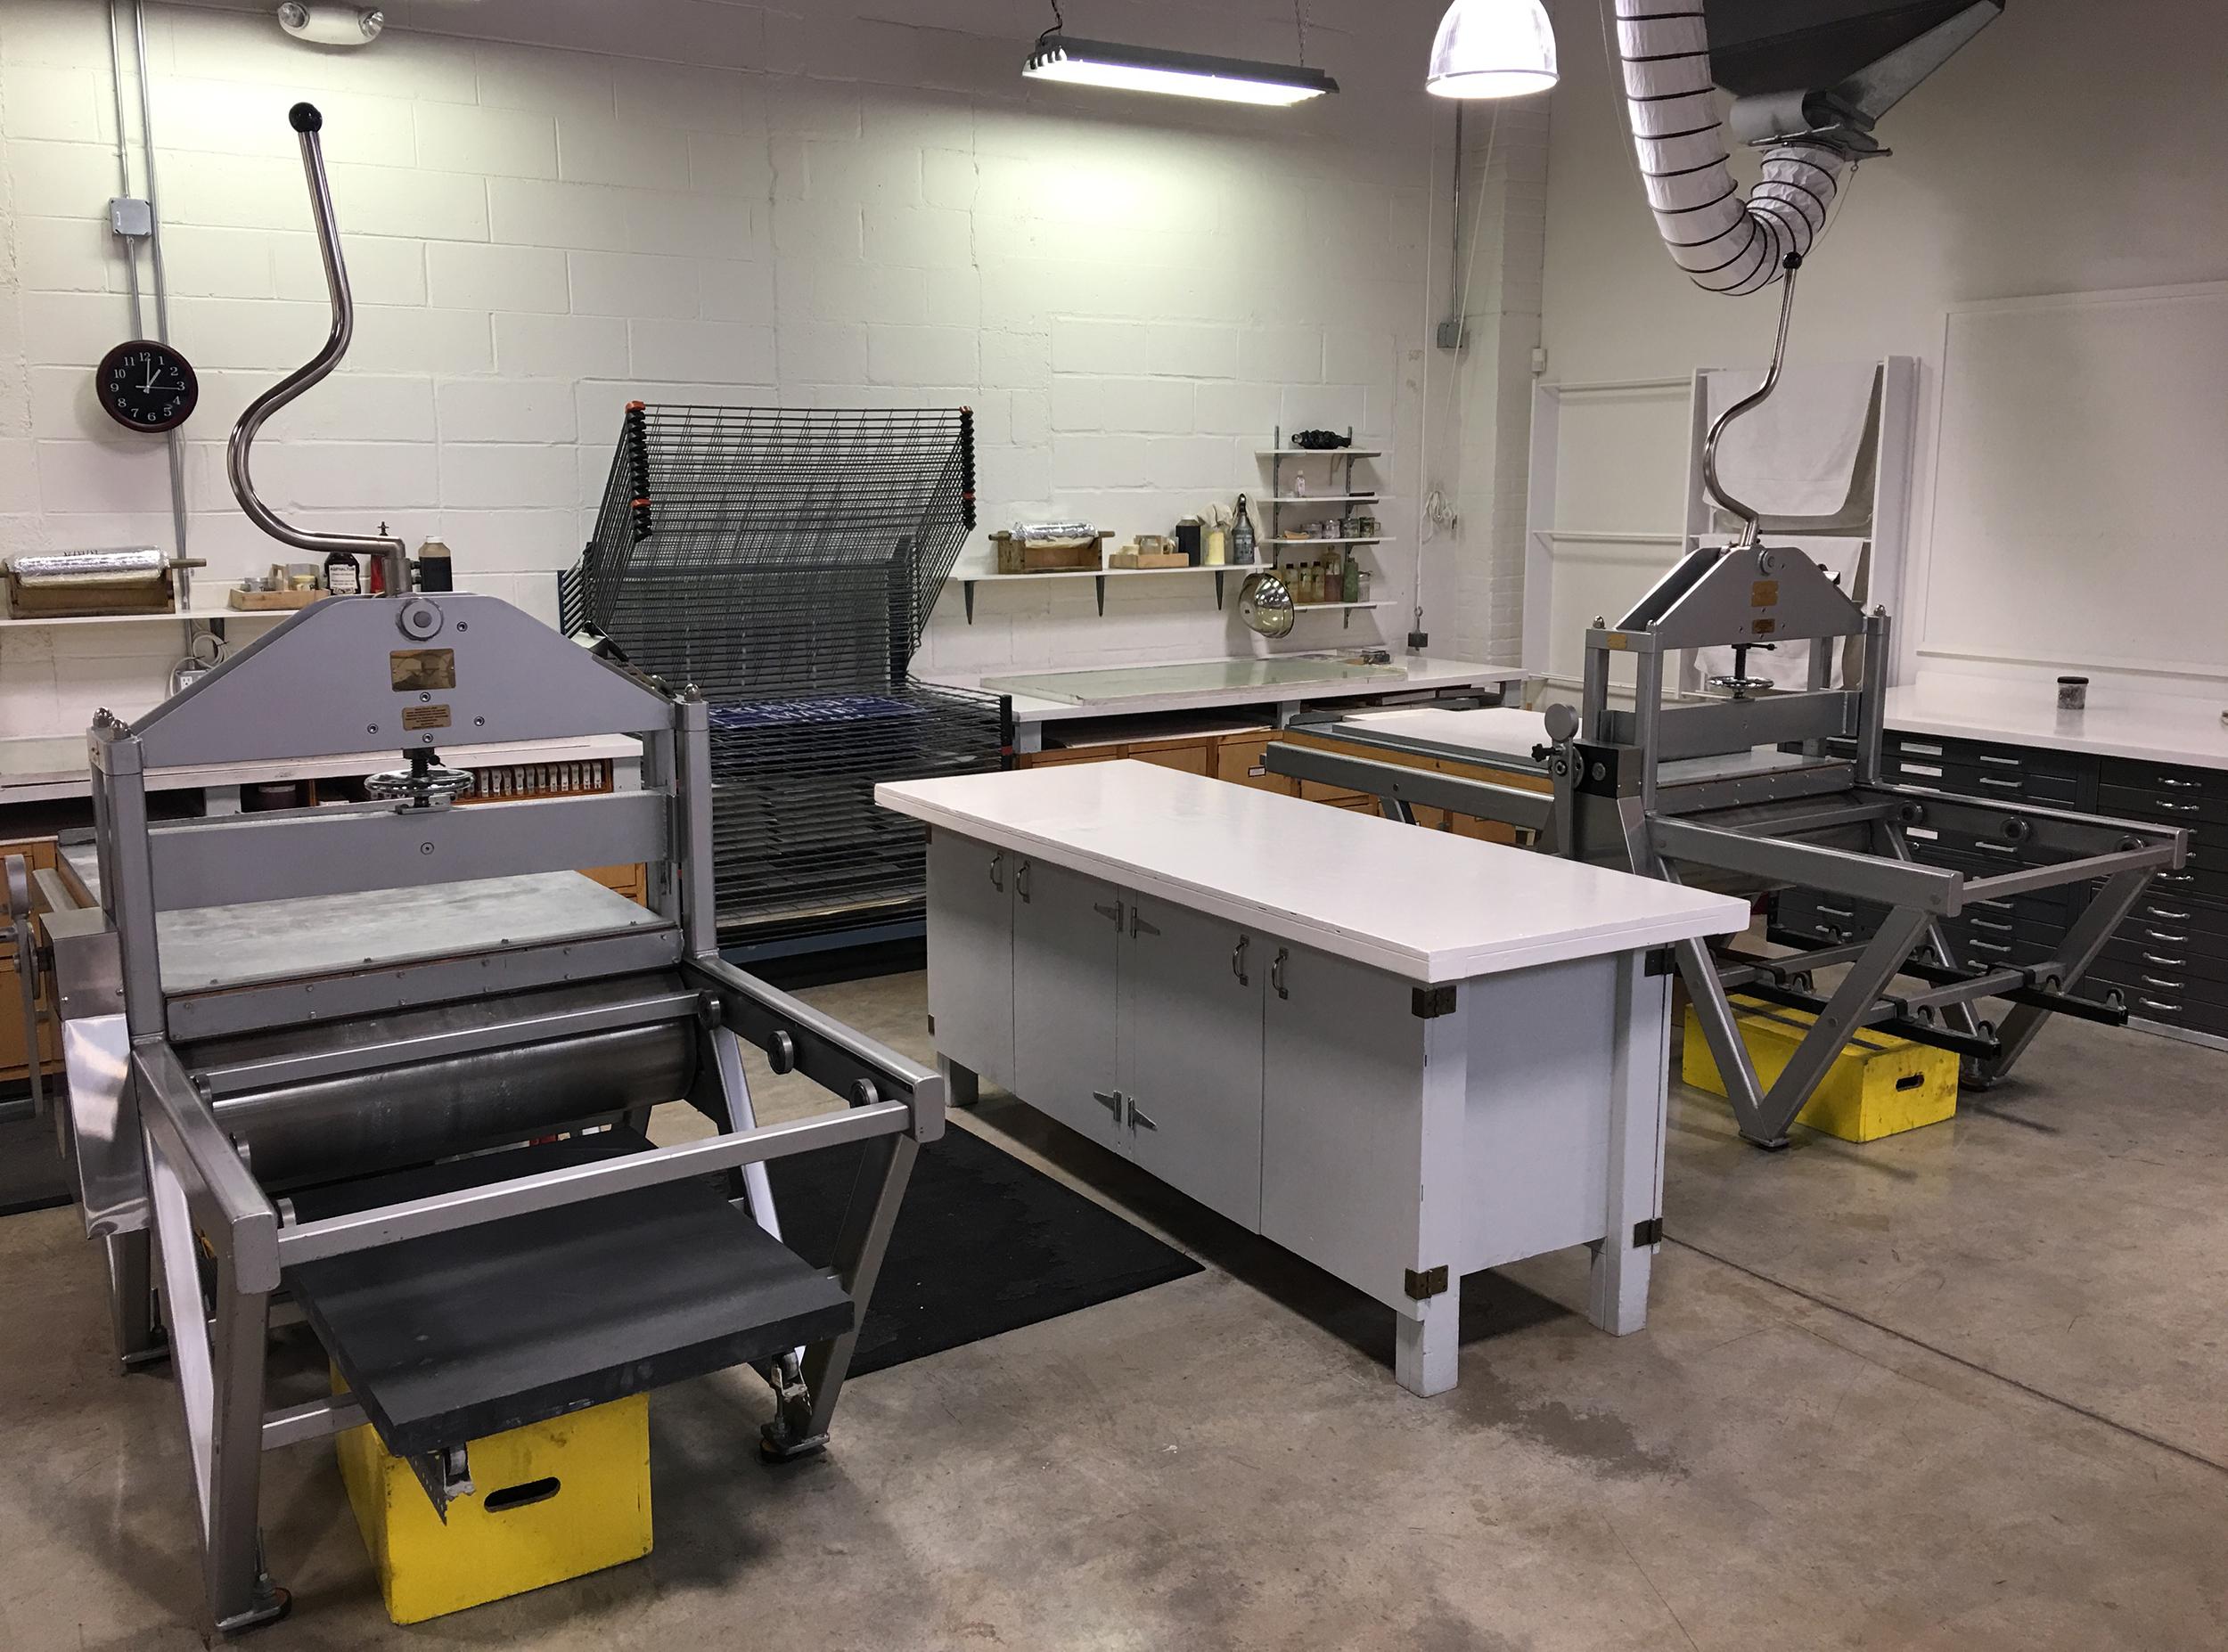 Litho press area